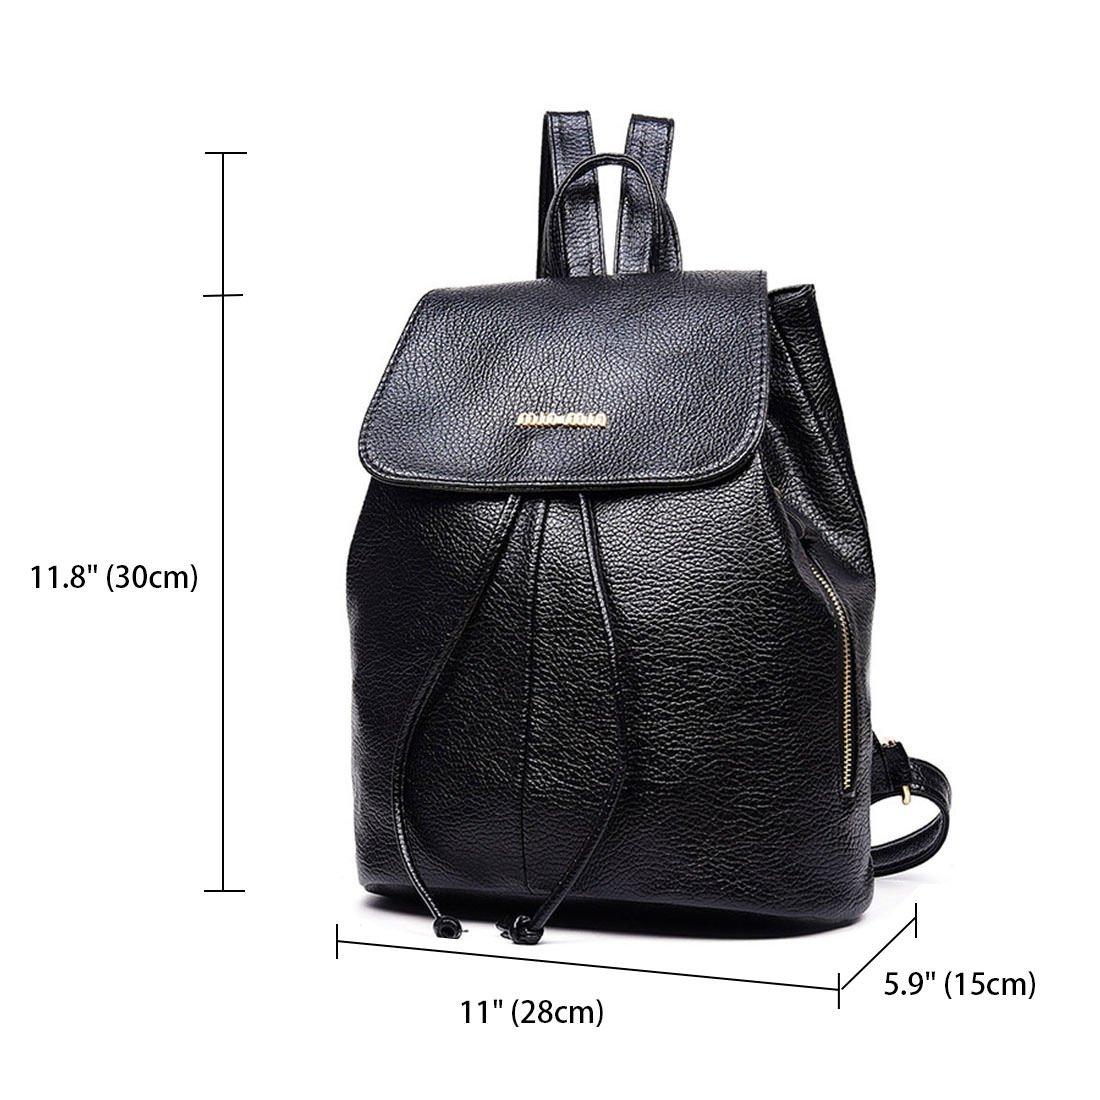 3df57a8d1b Amazon.com  Women Fashion Backpacks Totes Handbags Shoulder Bags Top-Handle  School Laptop Daypack PU Leather Black  Shoes